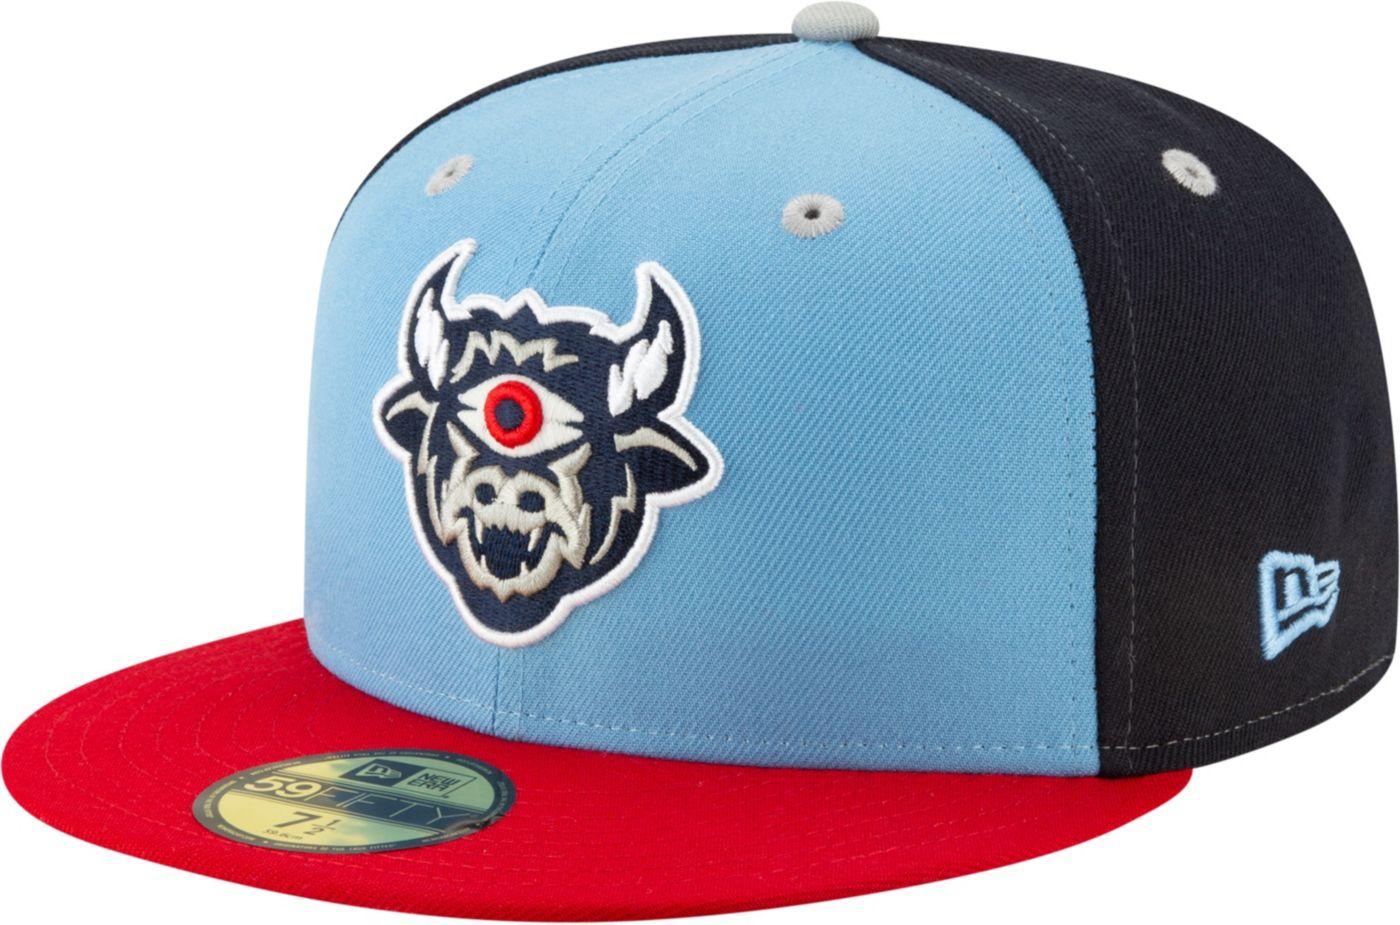 New Era Men's Durham Bulls 59Fifty 2019 COPA Authentic Hat